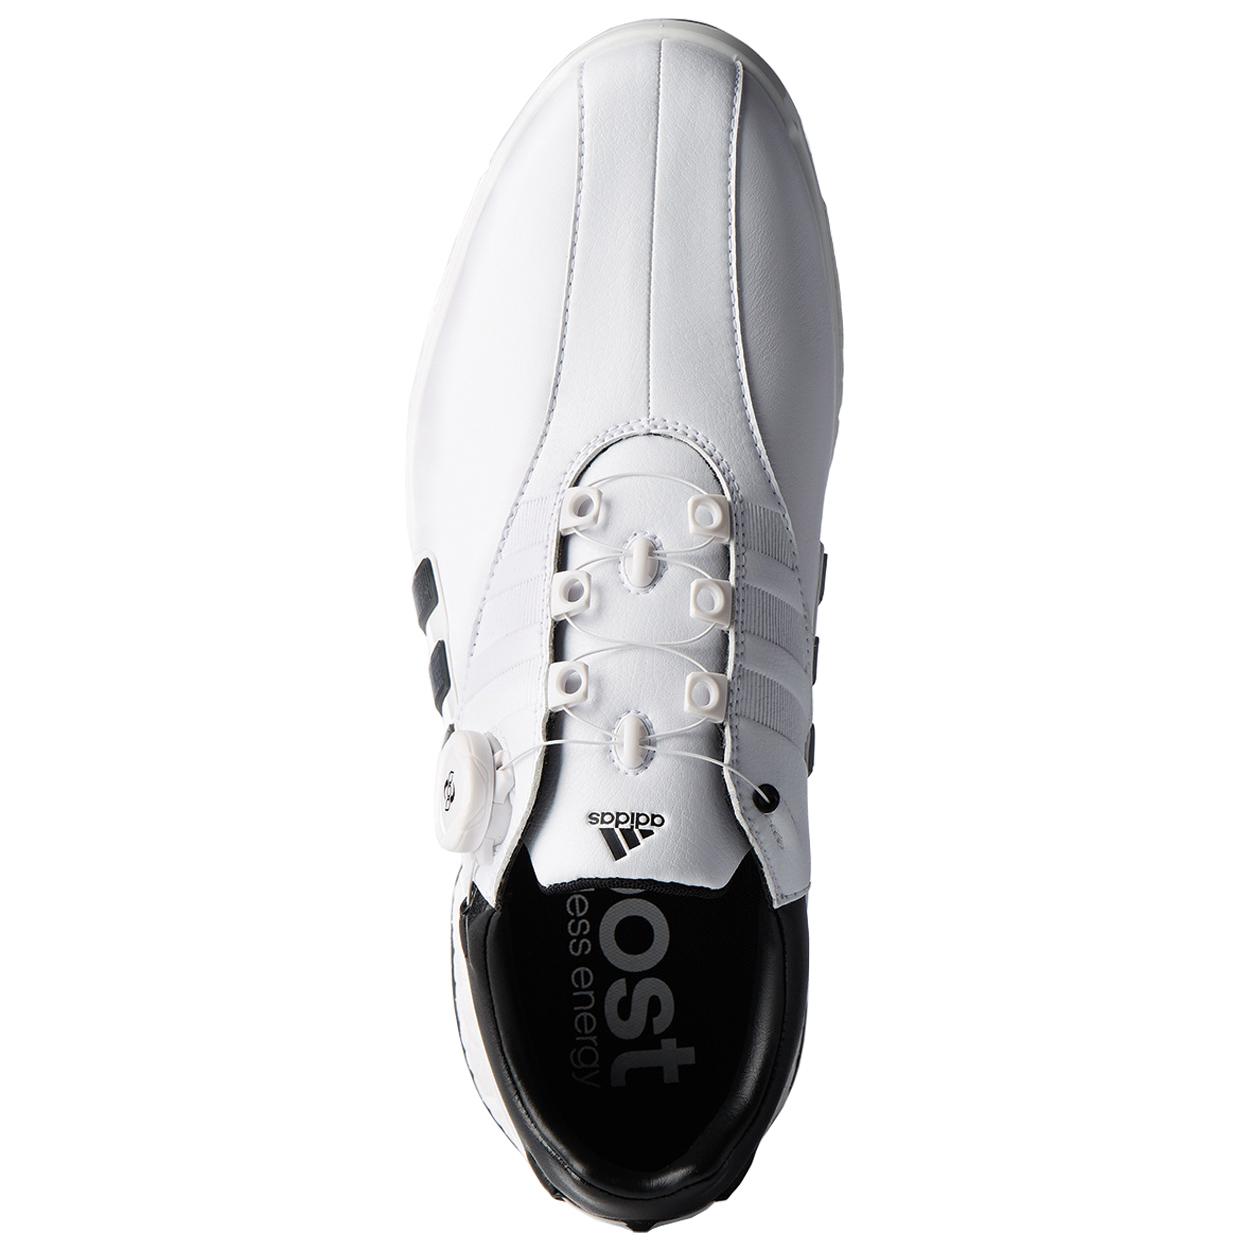 Adidas-Men-039-s-Tour-360-EQT-Boa-Golf-Shoes-Brand-New thumbnail 11